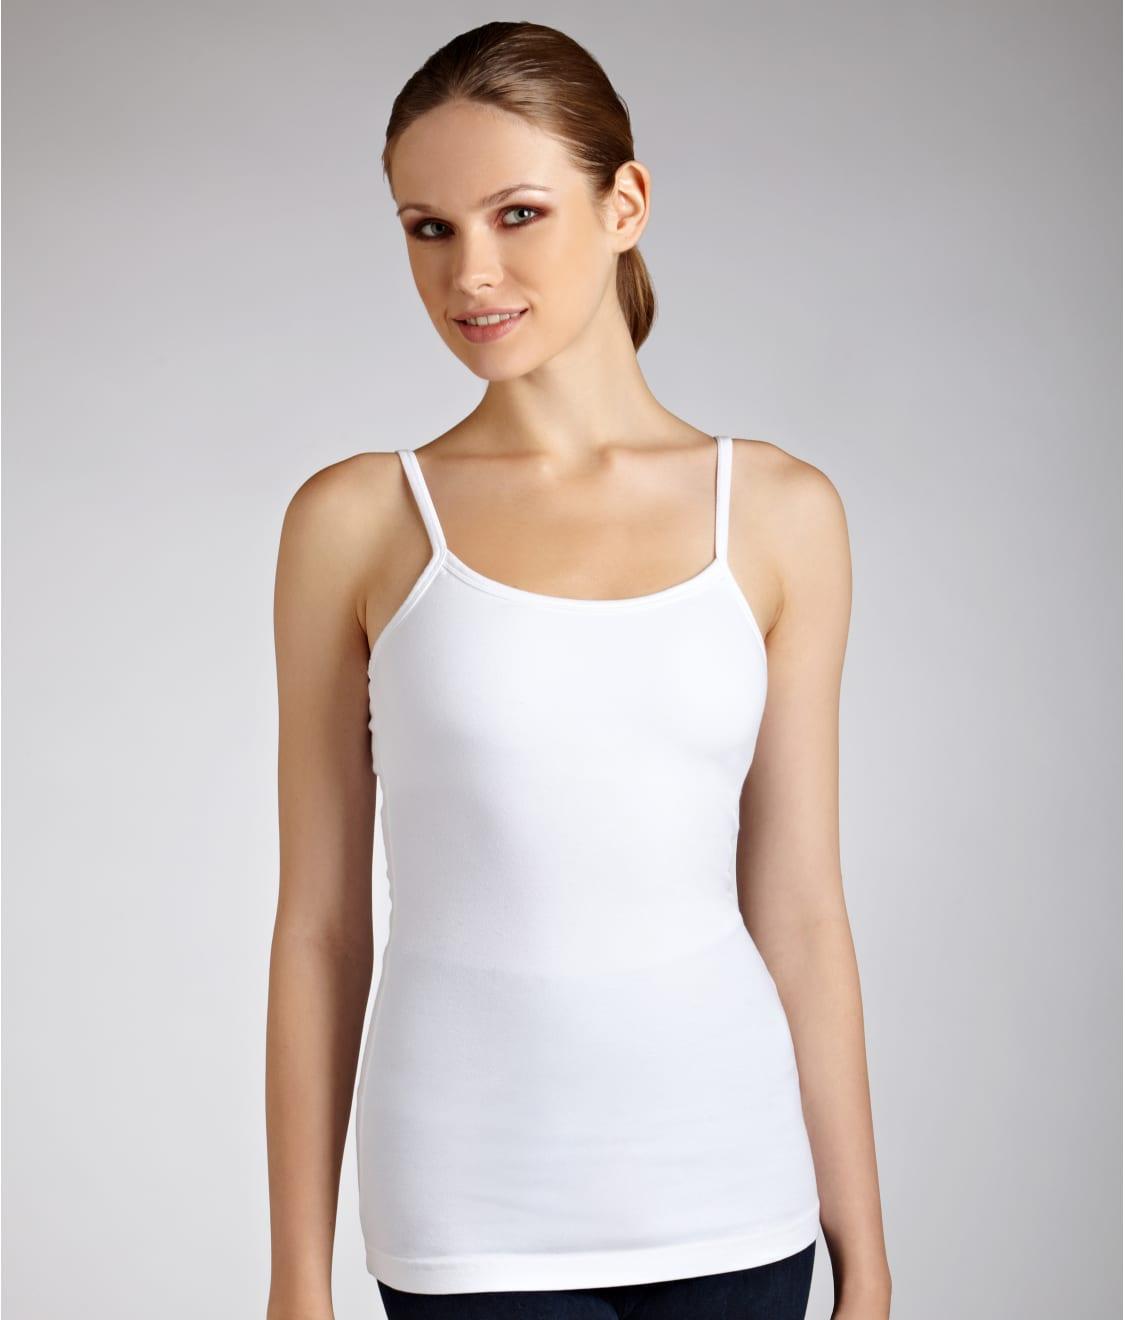 shelf cotton htm bra bella p ladies spandex camisole tank top